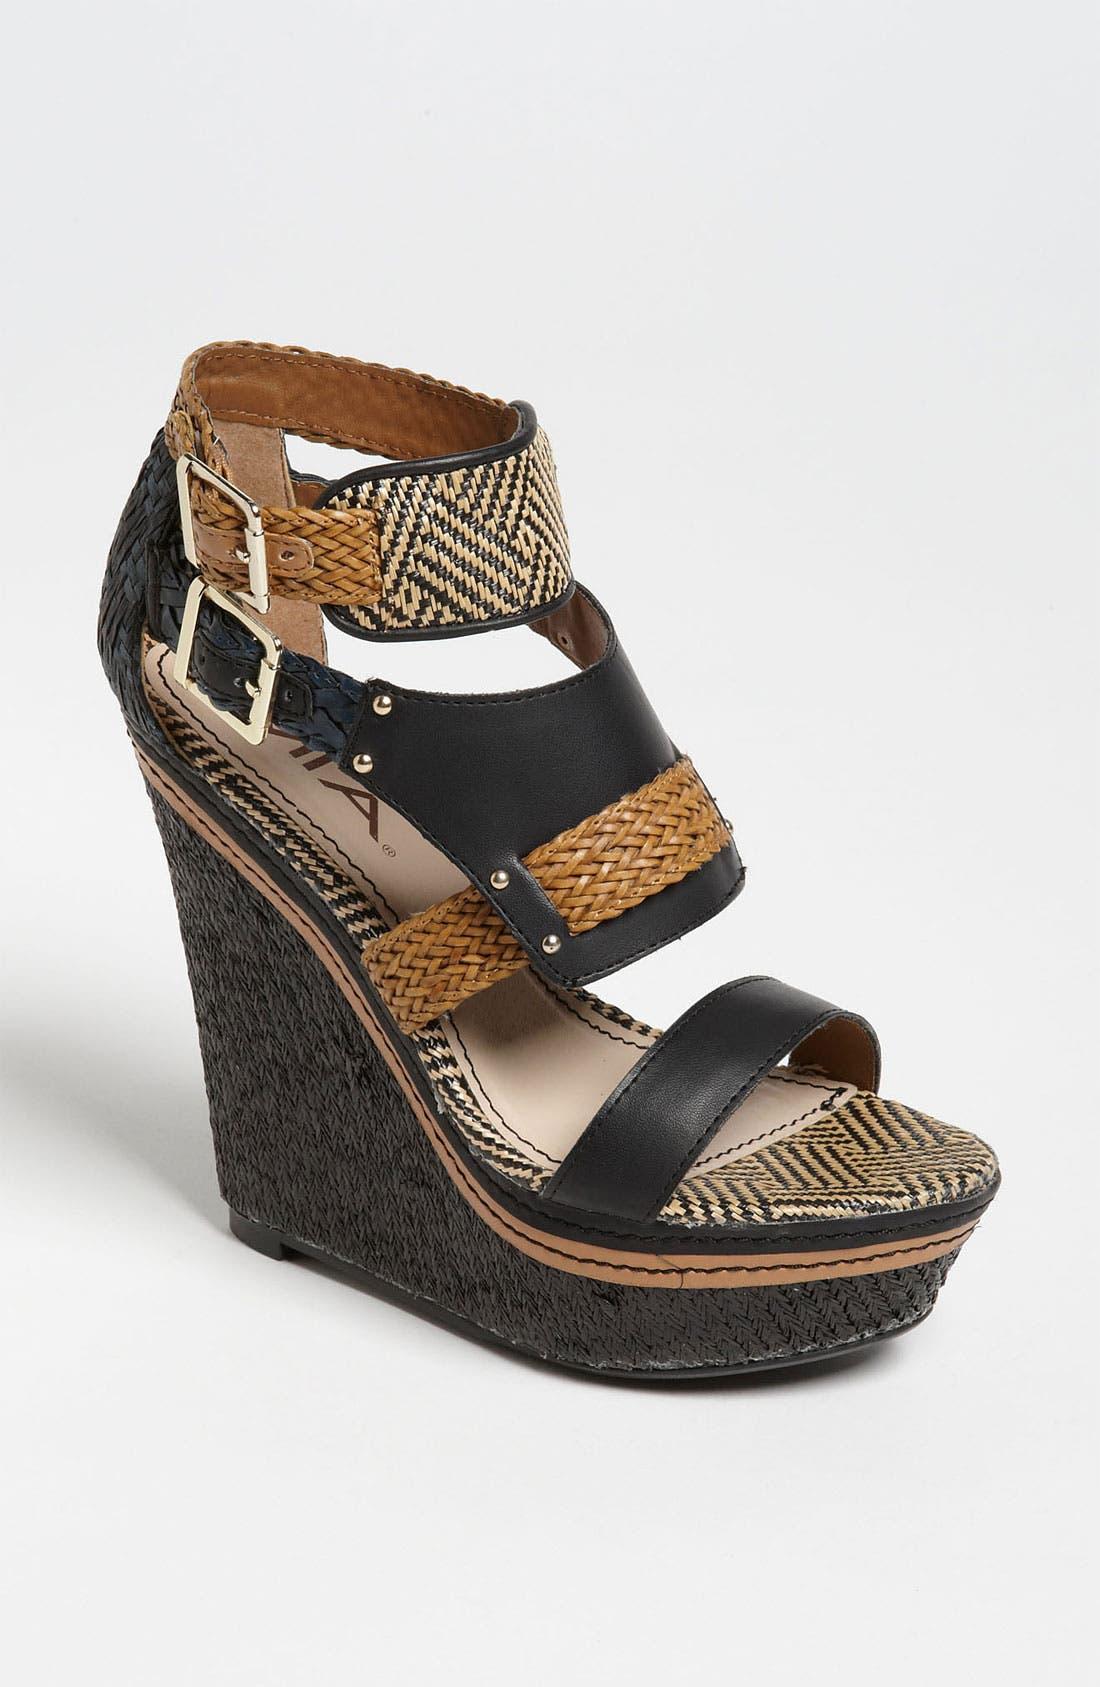 Main Image - MIA 'Frida' Wedge Sandal